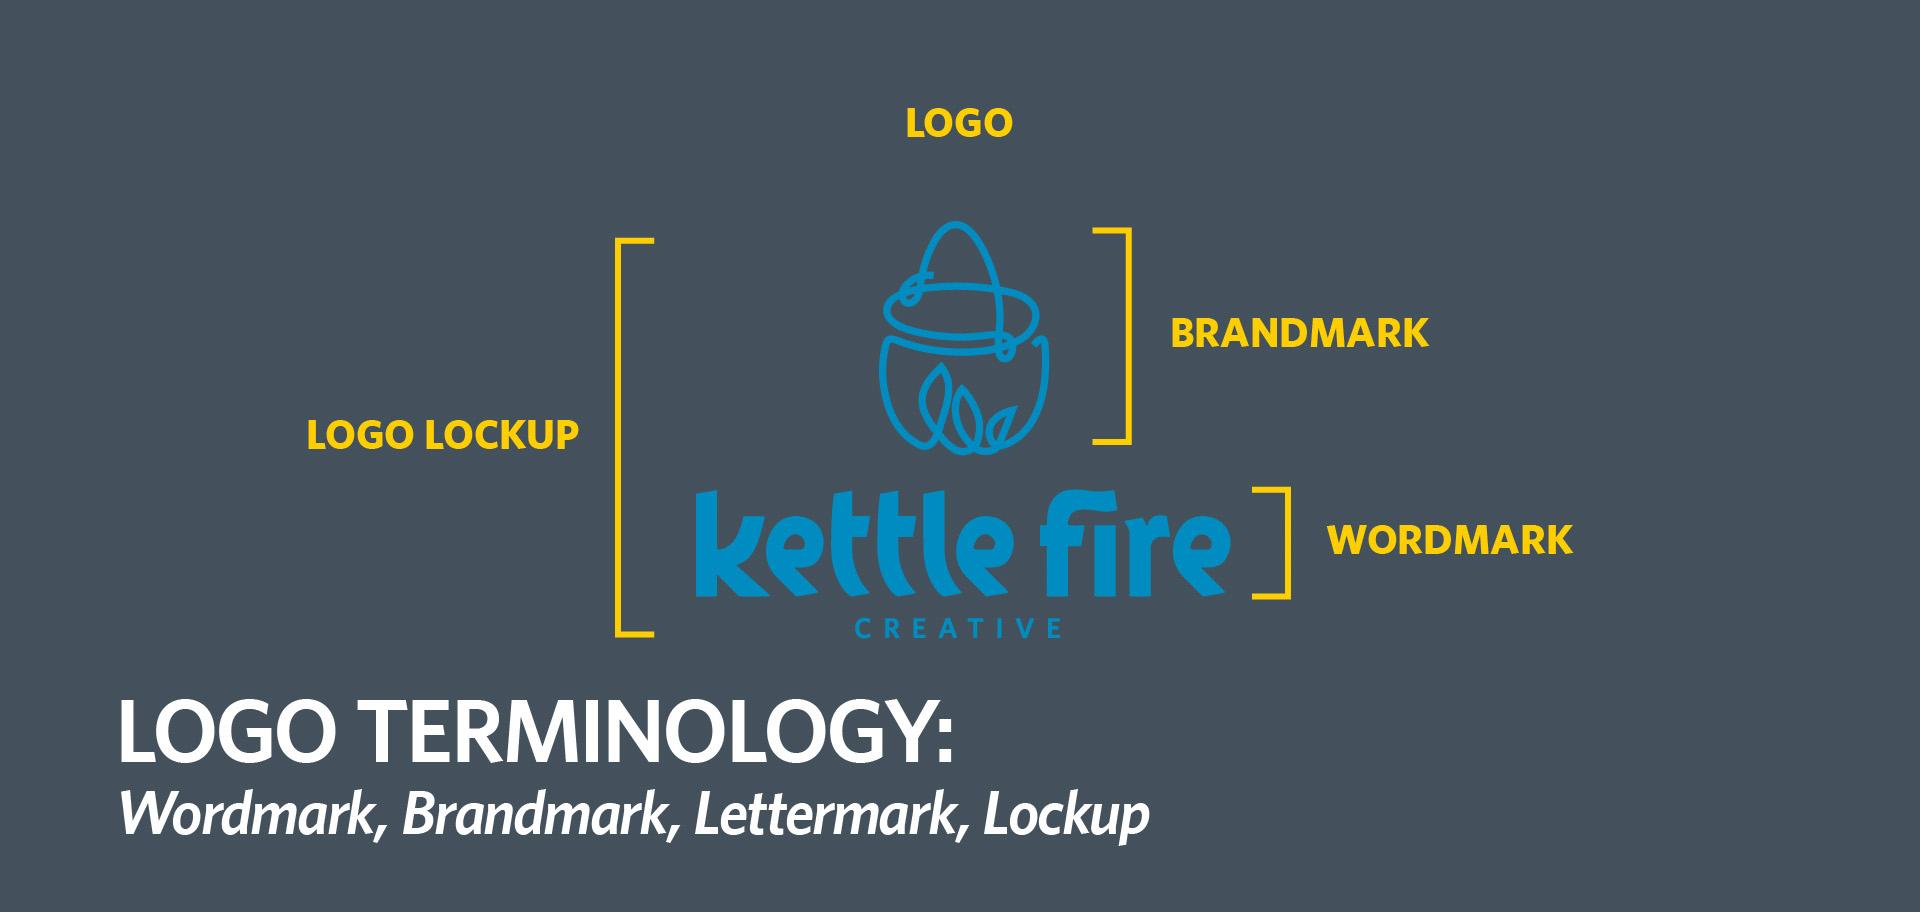 Logo terminology wordmark brandmark lettermark logo lockup design Kettle Fire Creative